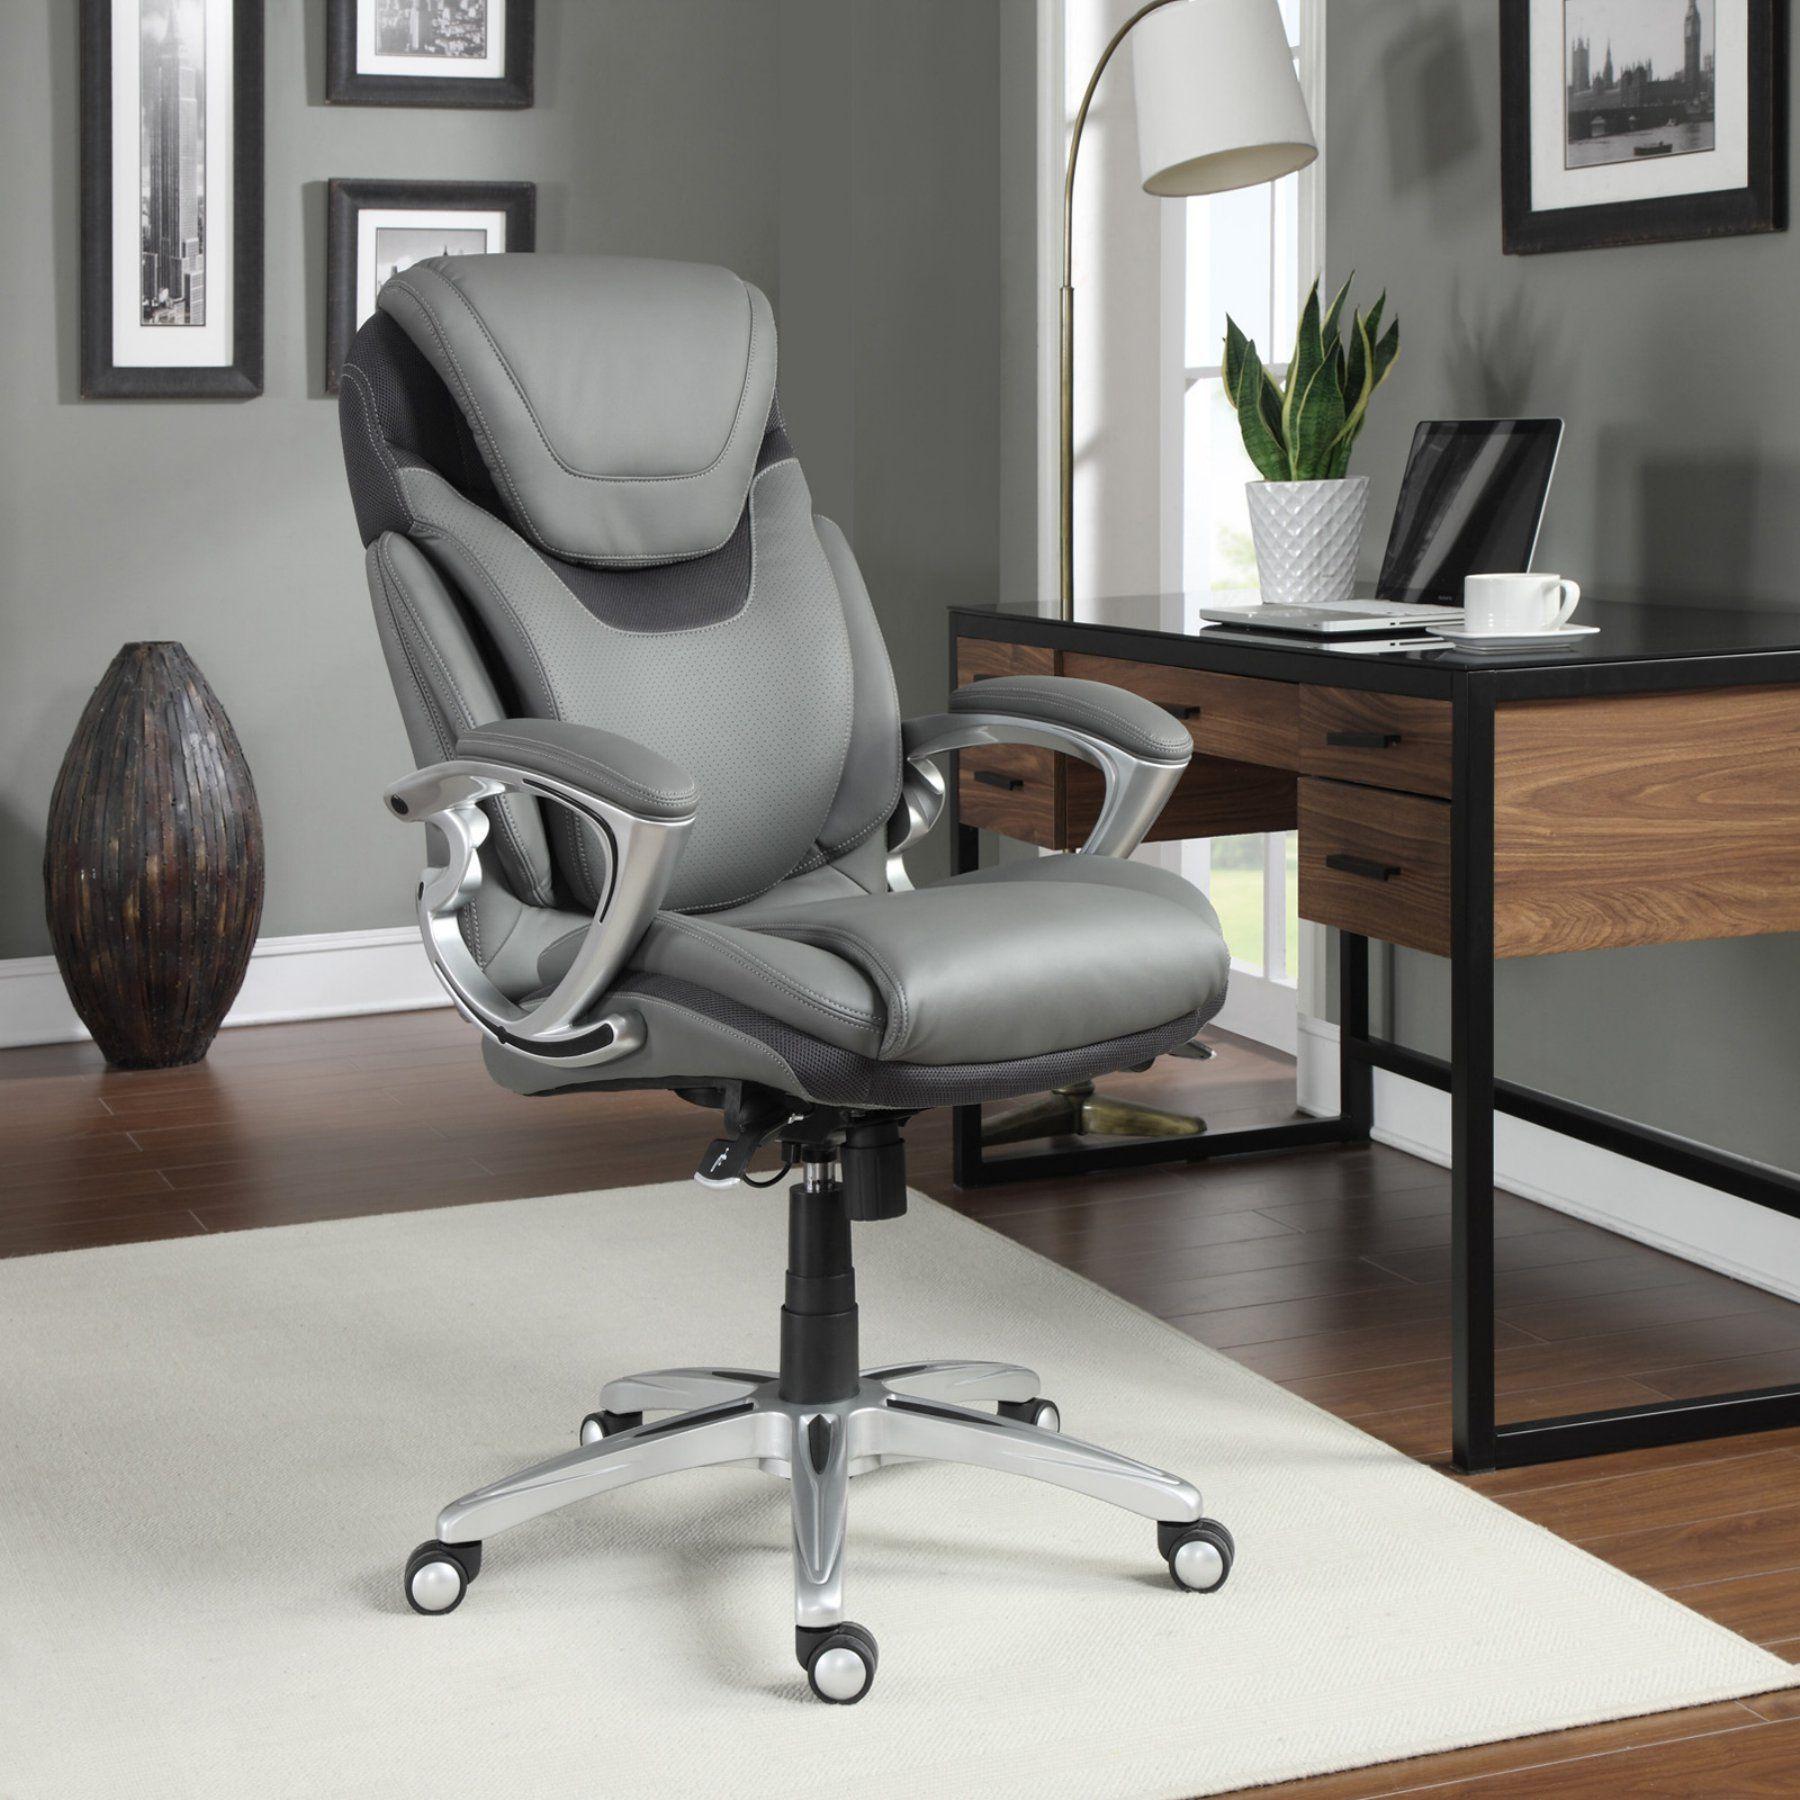 eco friendly office chair. Serta AIR Health \u0026 Wellness Eco-friendly Bonded Leather Executive Office Chair - 43807 Eco Friendly